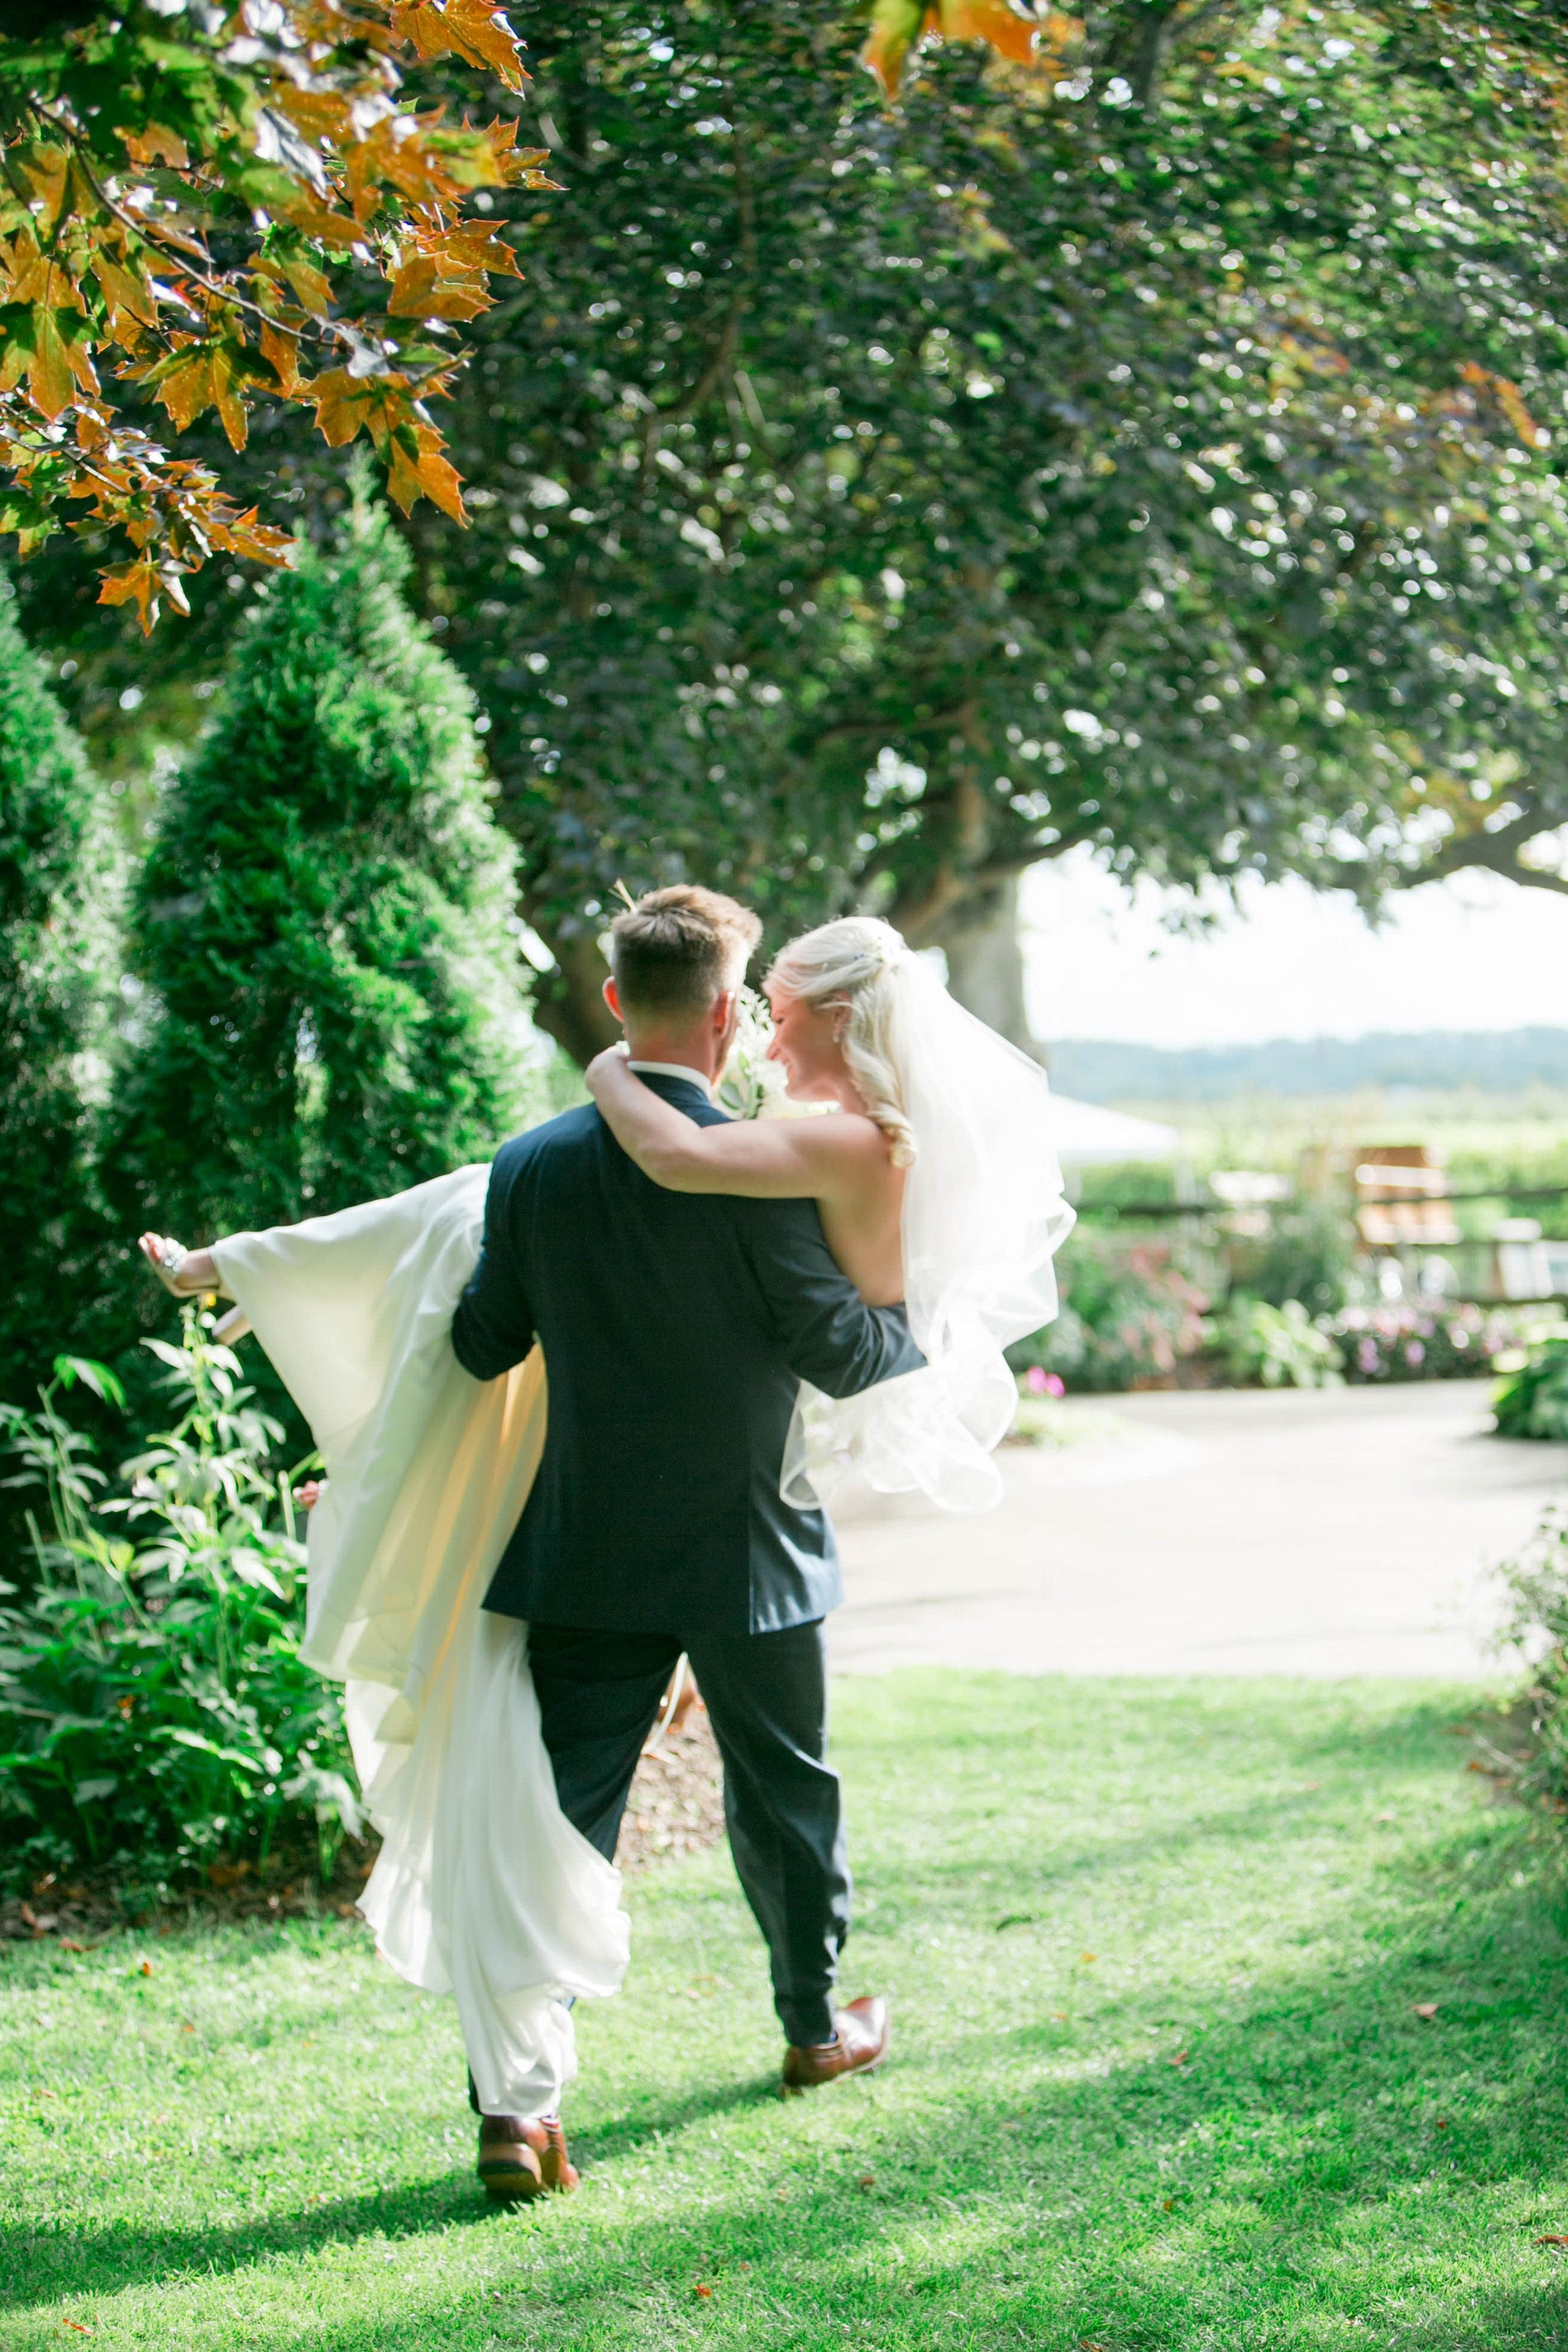 Maddy___Brandon___Daniel_Ricci_Weddings_High_Res._Finals_323.jpg